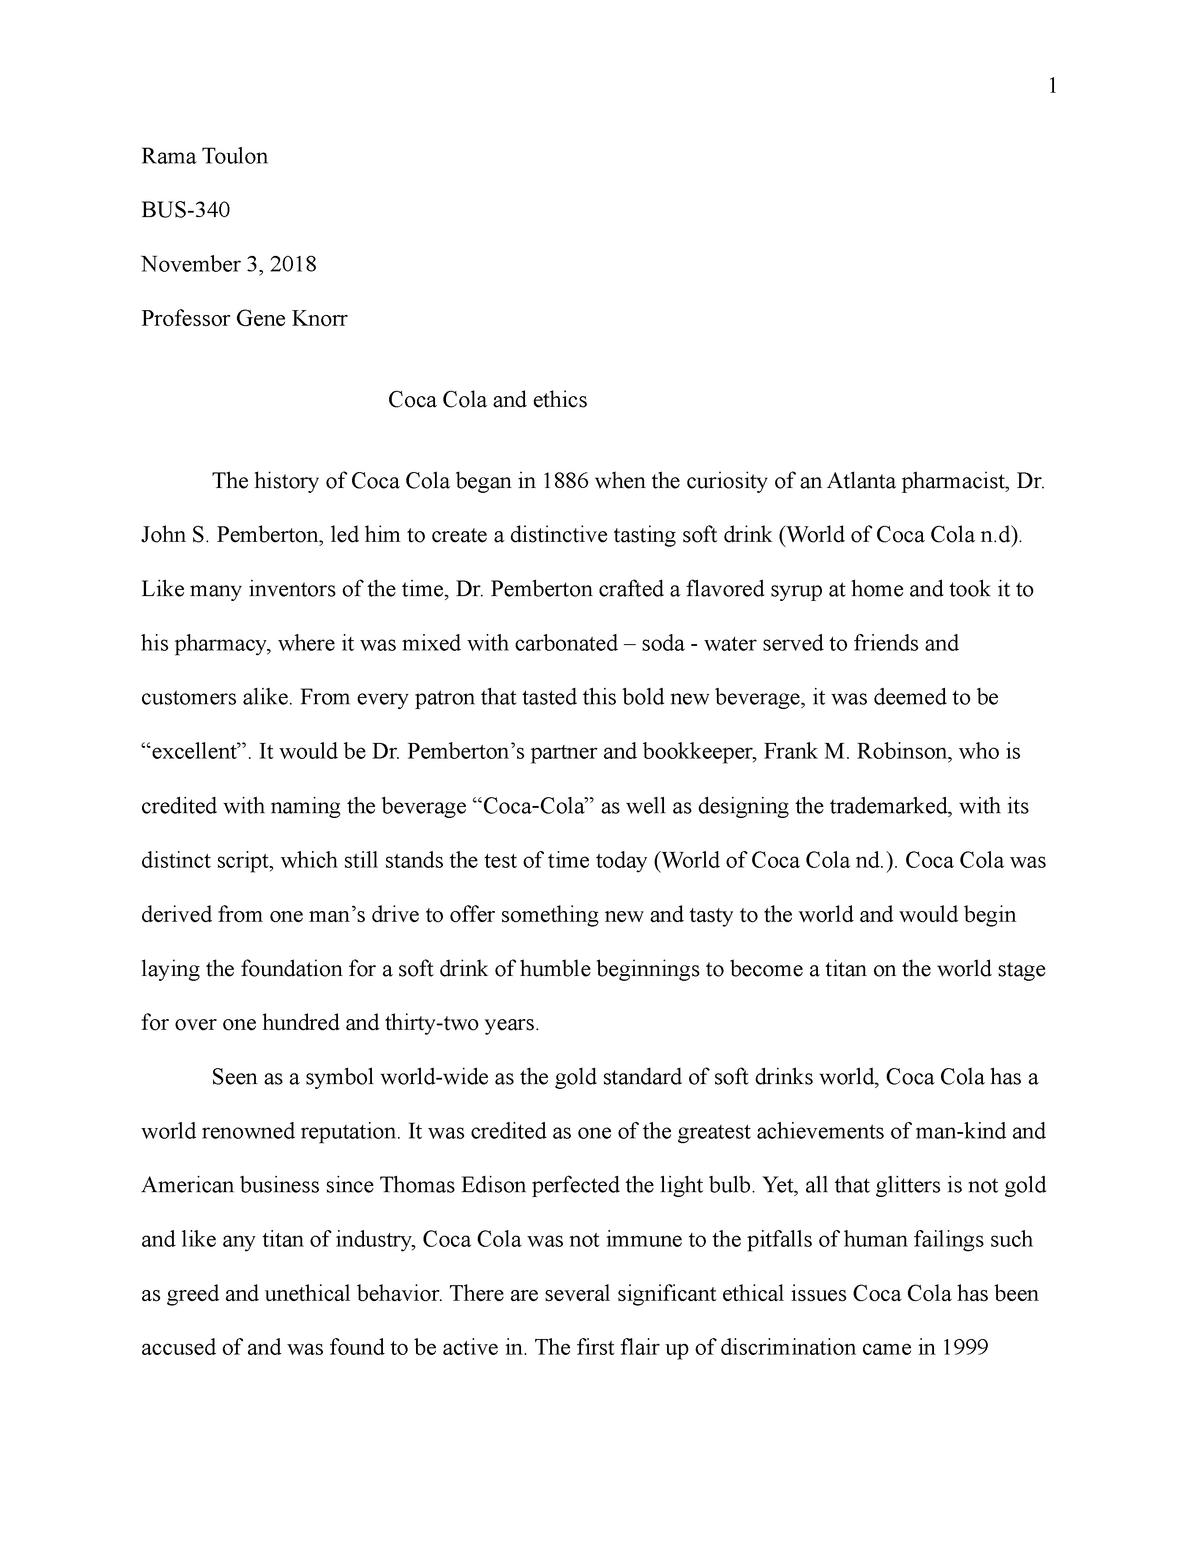 Ethics Case study - Coca Cola Final Draft - MGT-420: Organizational